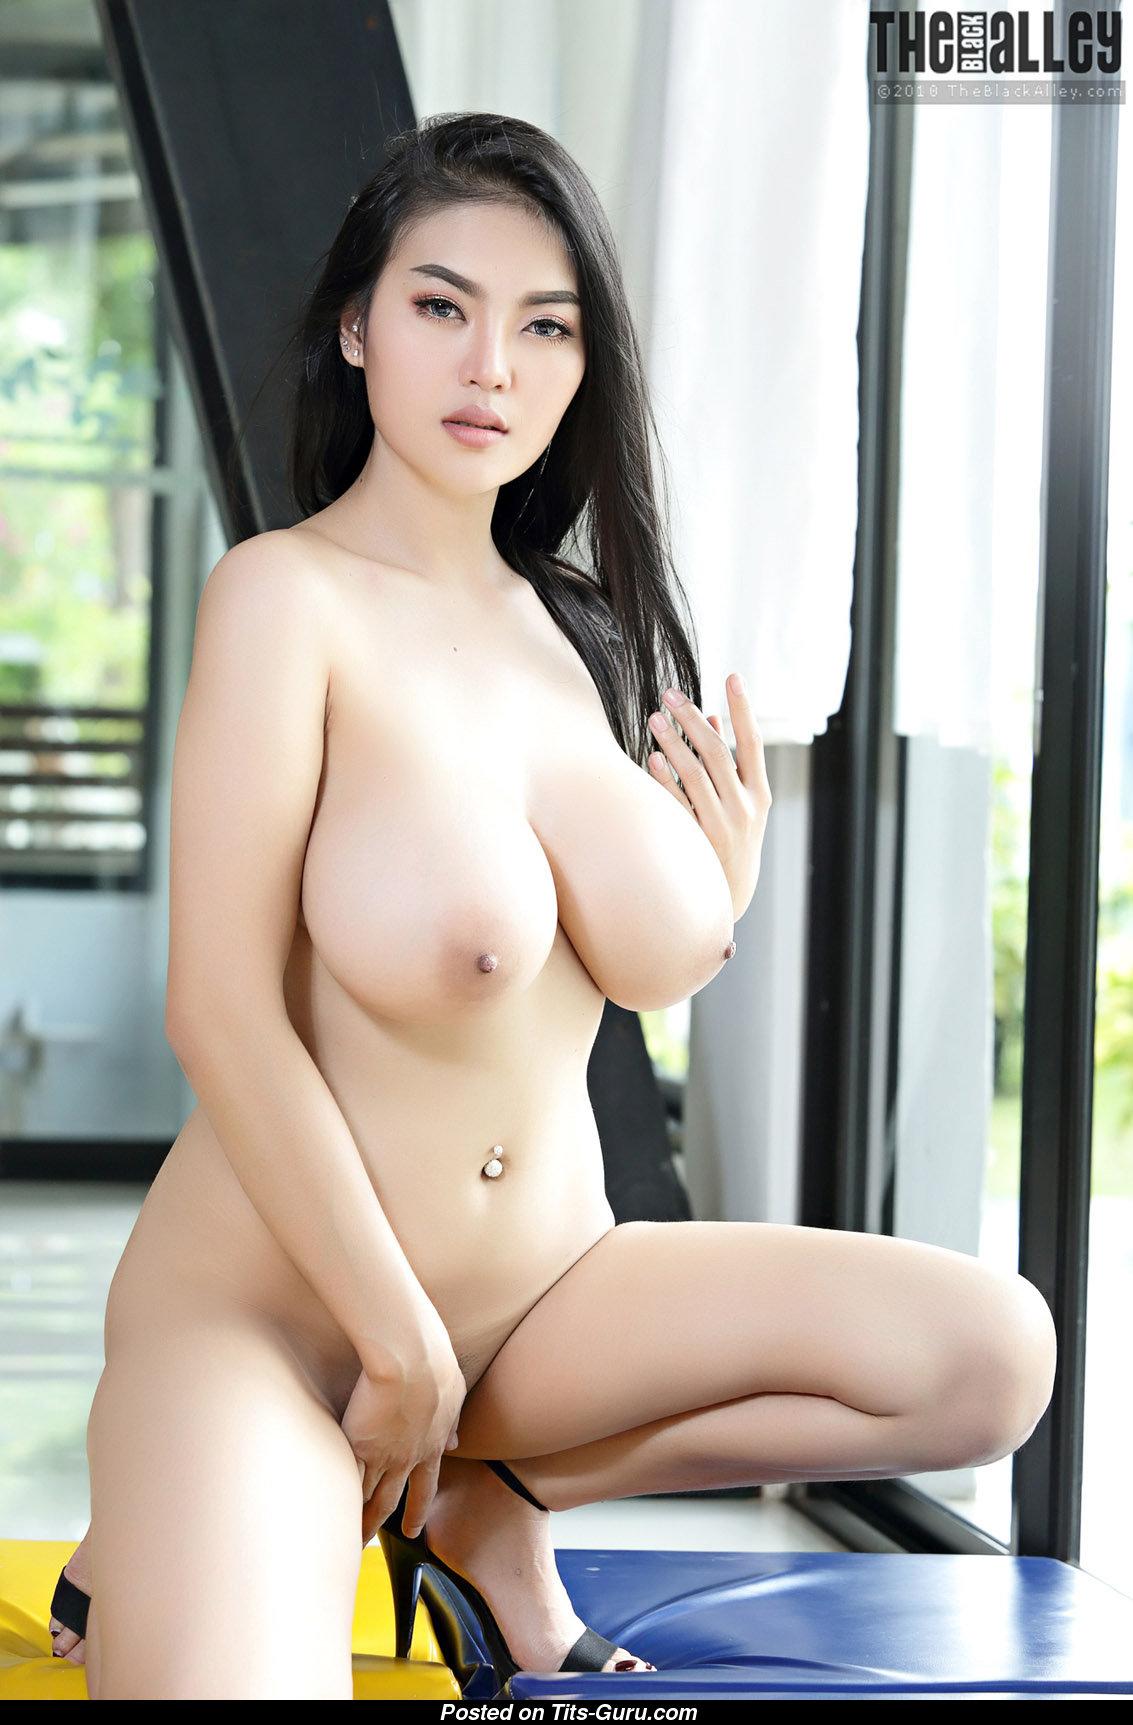 Pitta - Asian Girlfriend & Babe with Bald Real Medium ...